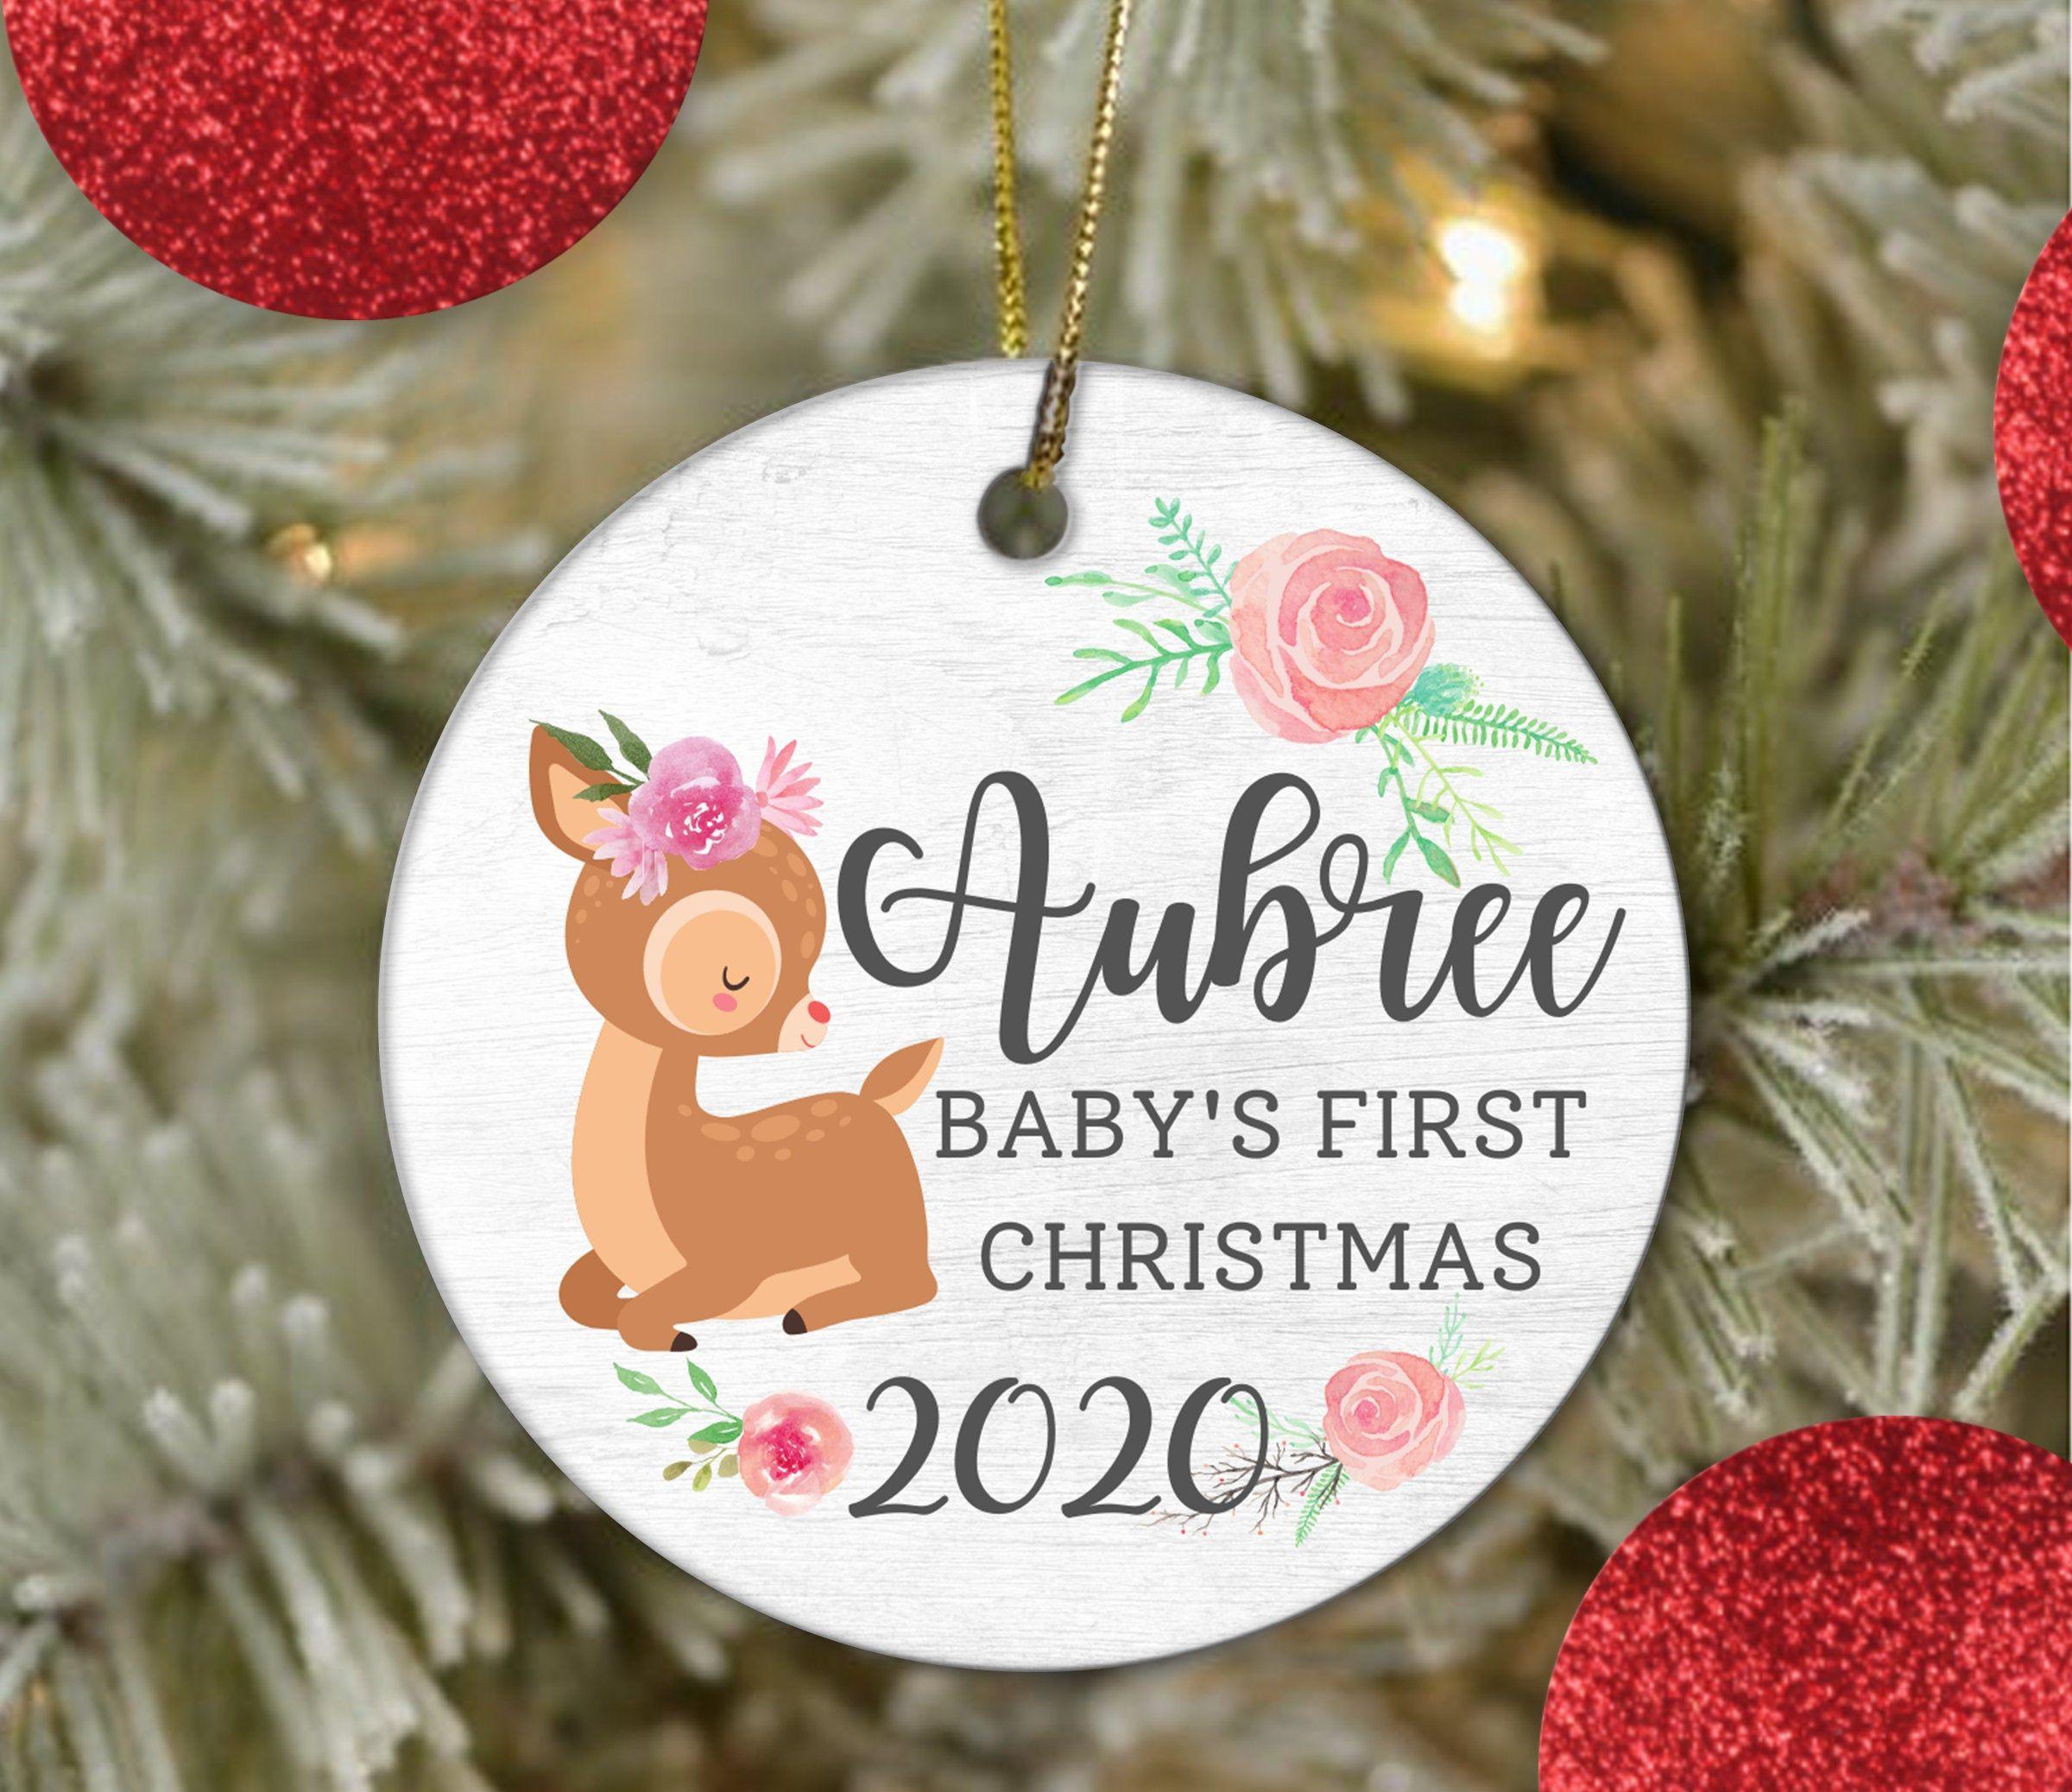 Baby S First Christmas Ornament Baby Deer Boho Personalized Baby Ornament 2 Babies First Christmas First Christmas Ornament Christmas Ornaments To Make